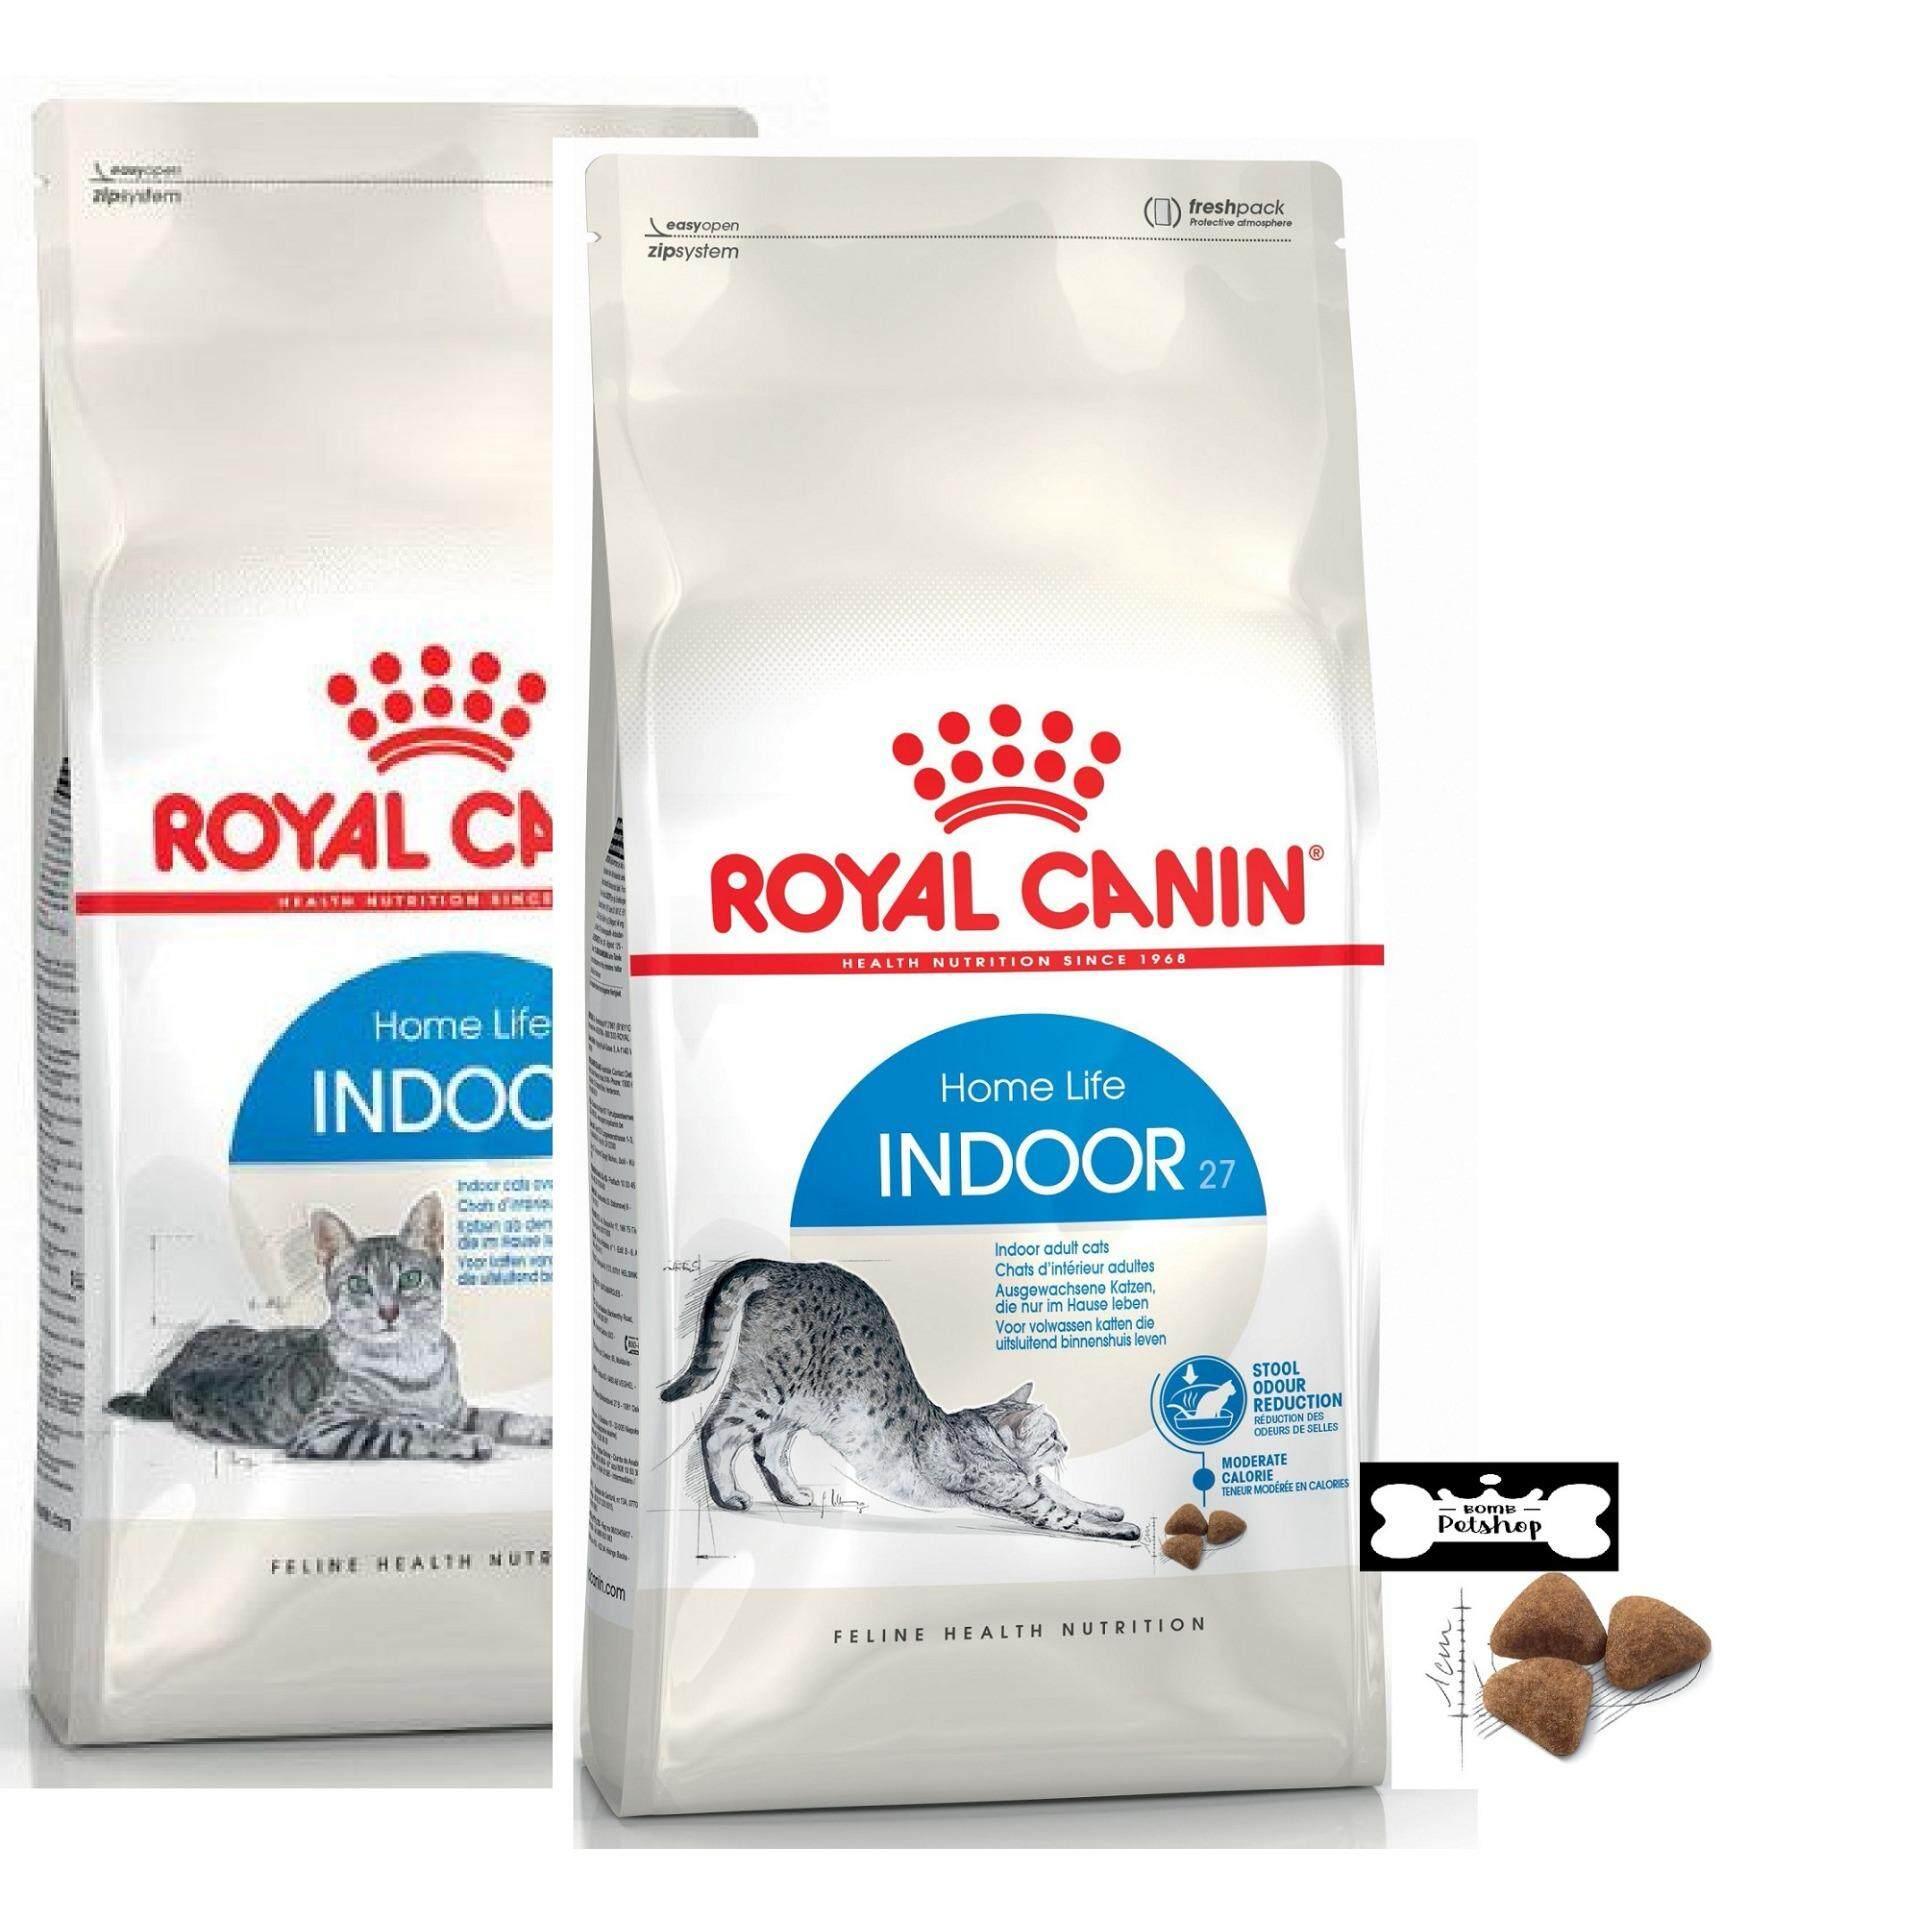 Royal Canin Home Life Indoor 27 อาหารสำหรับแมวโตเลี้ยงในบ้าน ขนาด 400 กรัม 2 Units เป็นต้นฉบับ